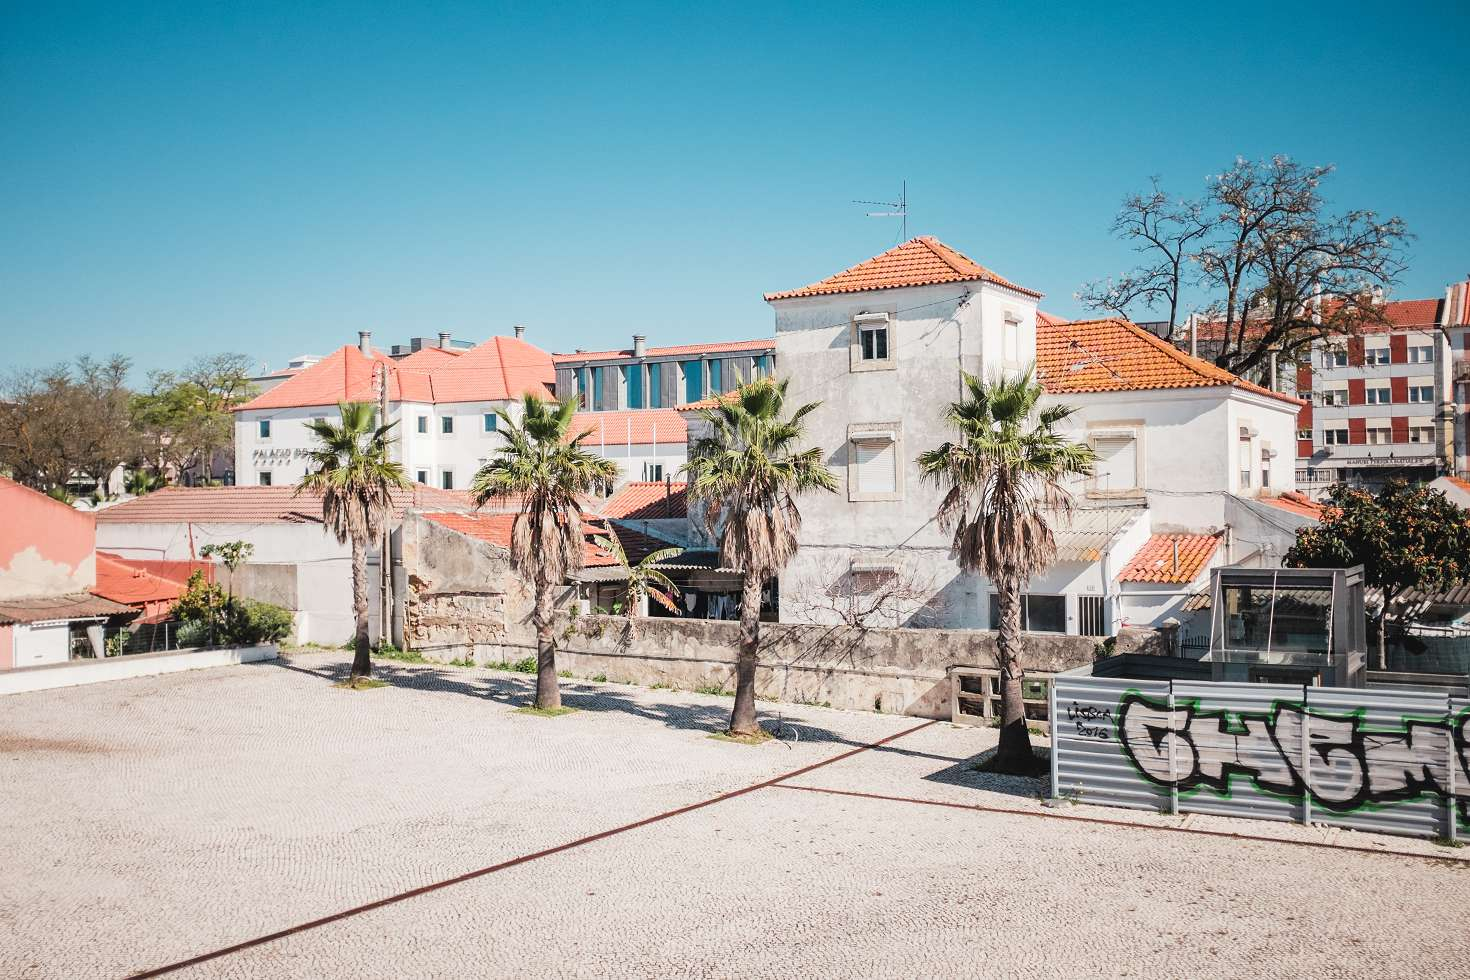 Valencia-Lissabon-Vigo-Stonehenge (14)